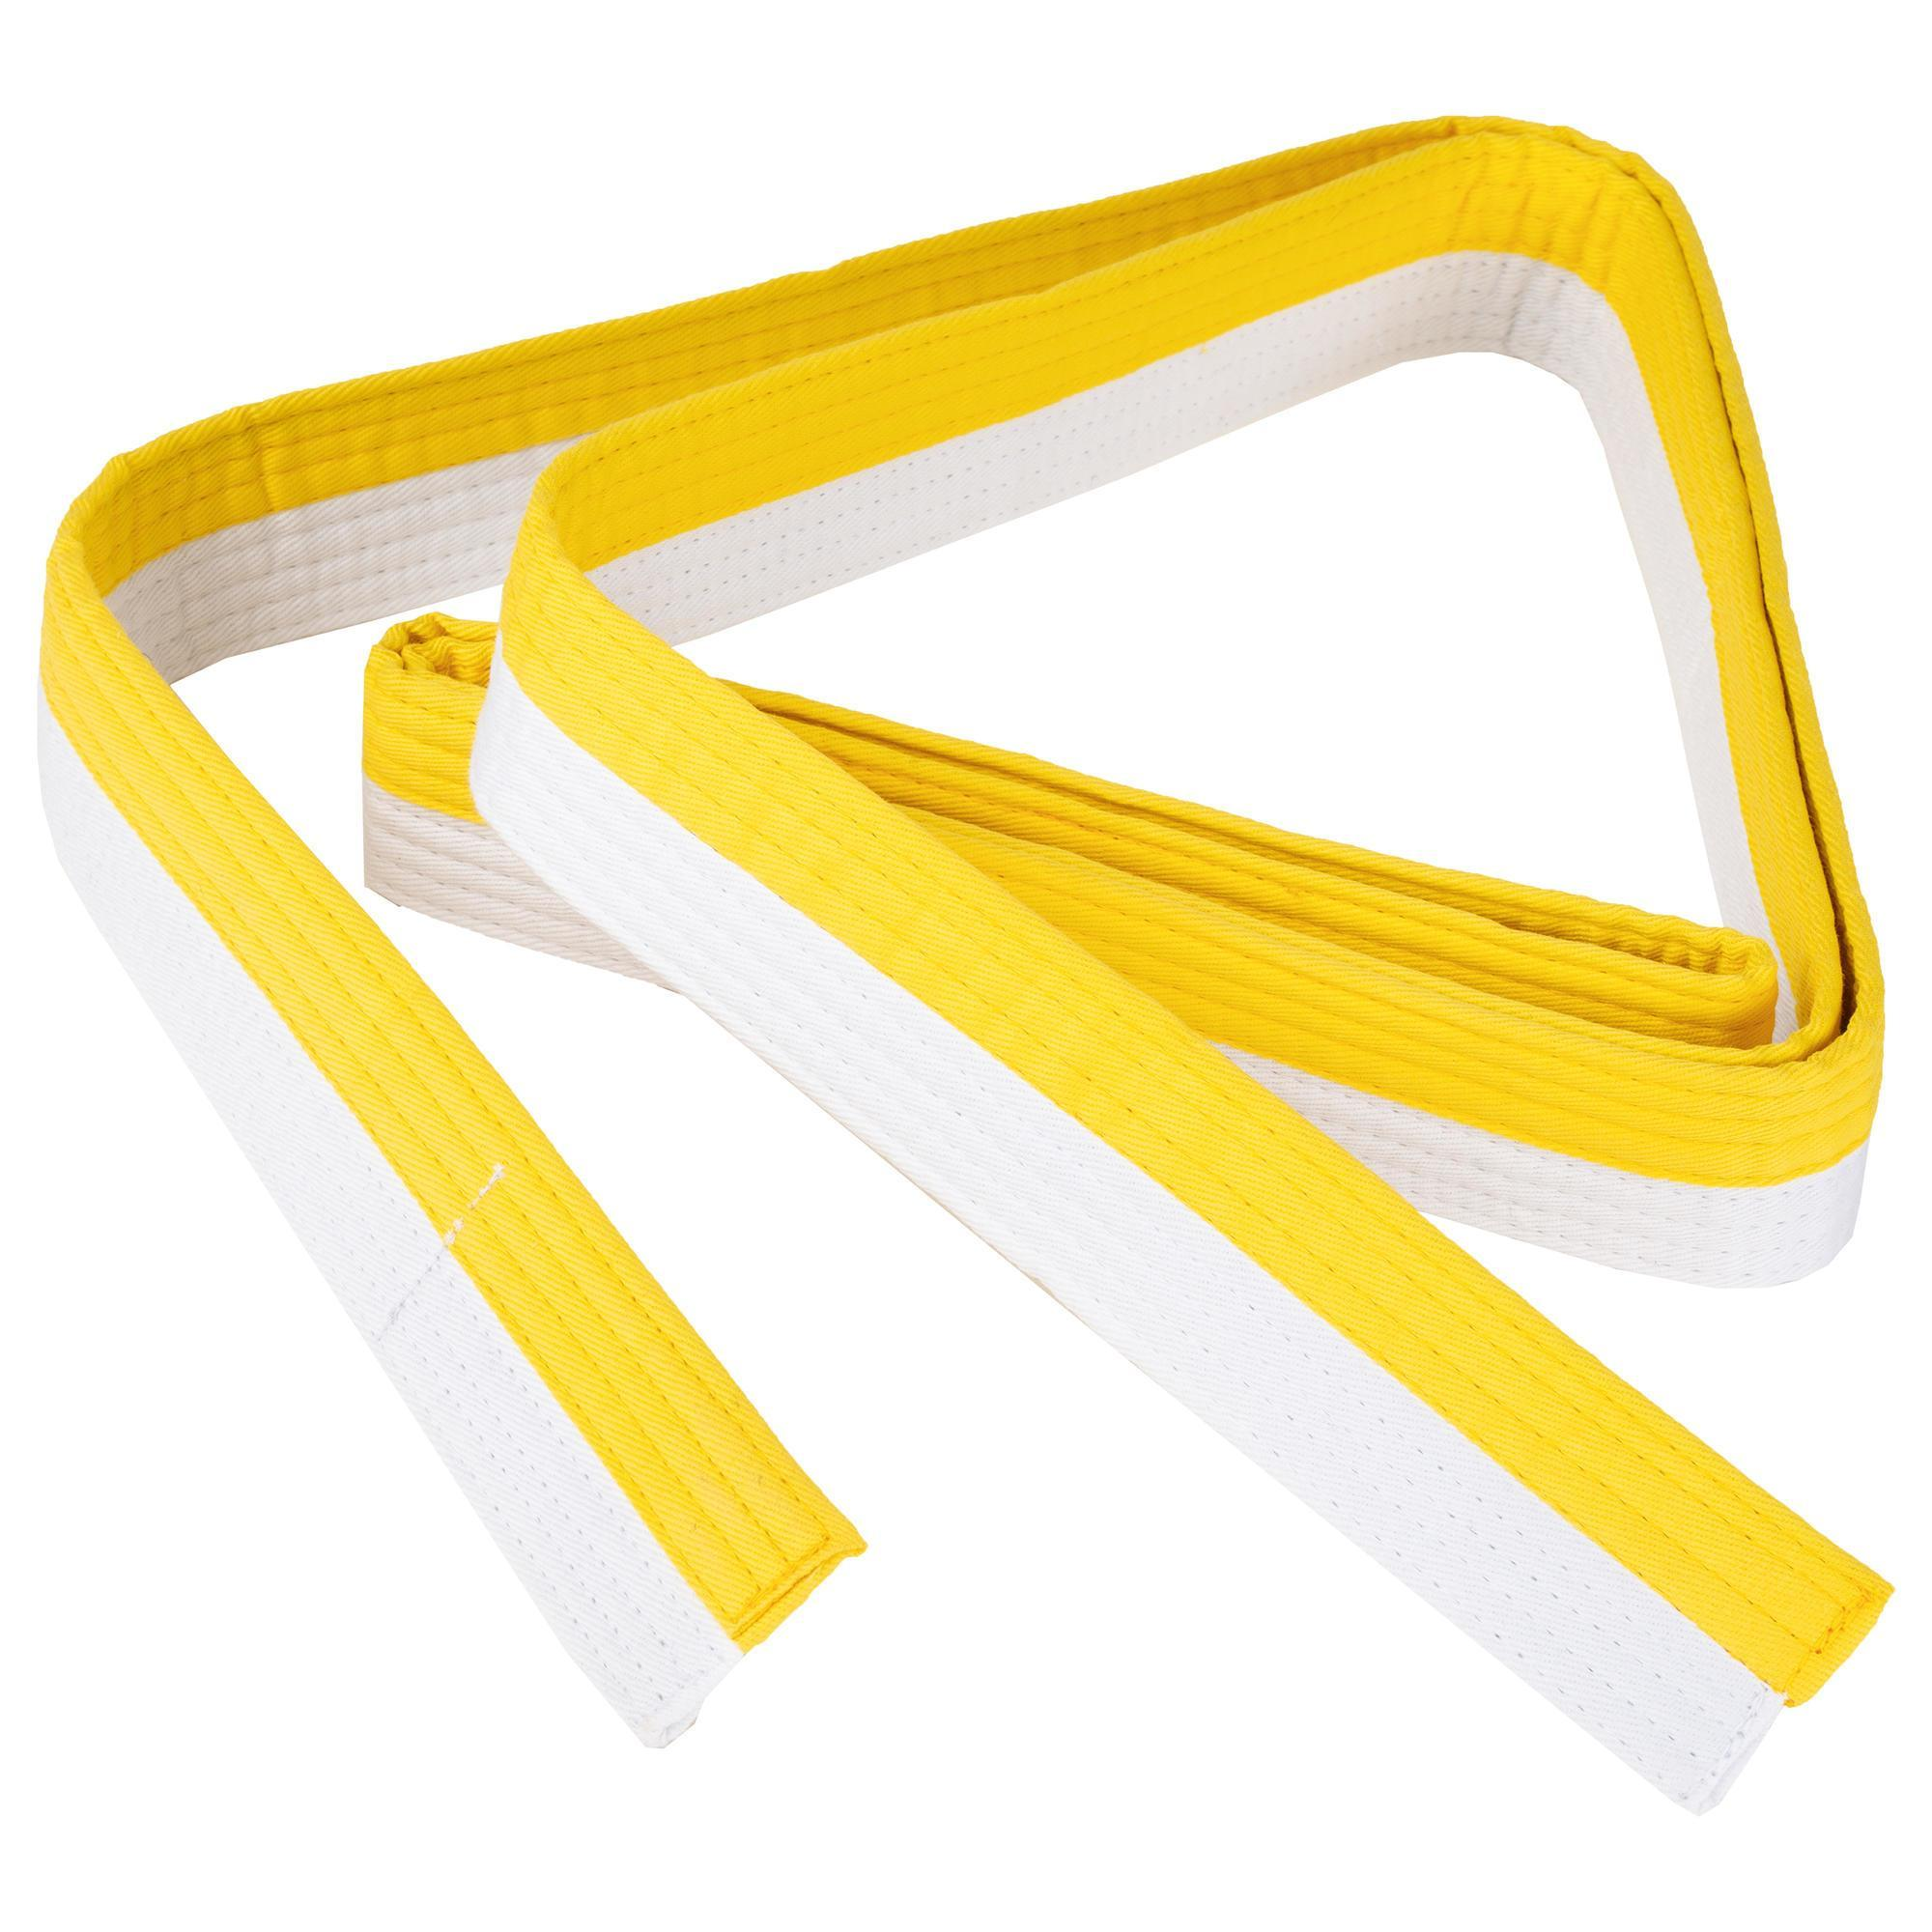 Outshock Judoband / Karateband 2,50 m, wit/geel